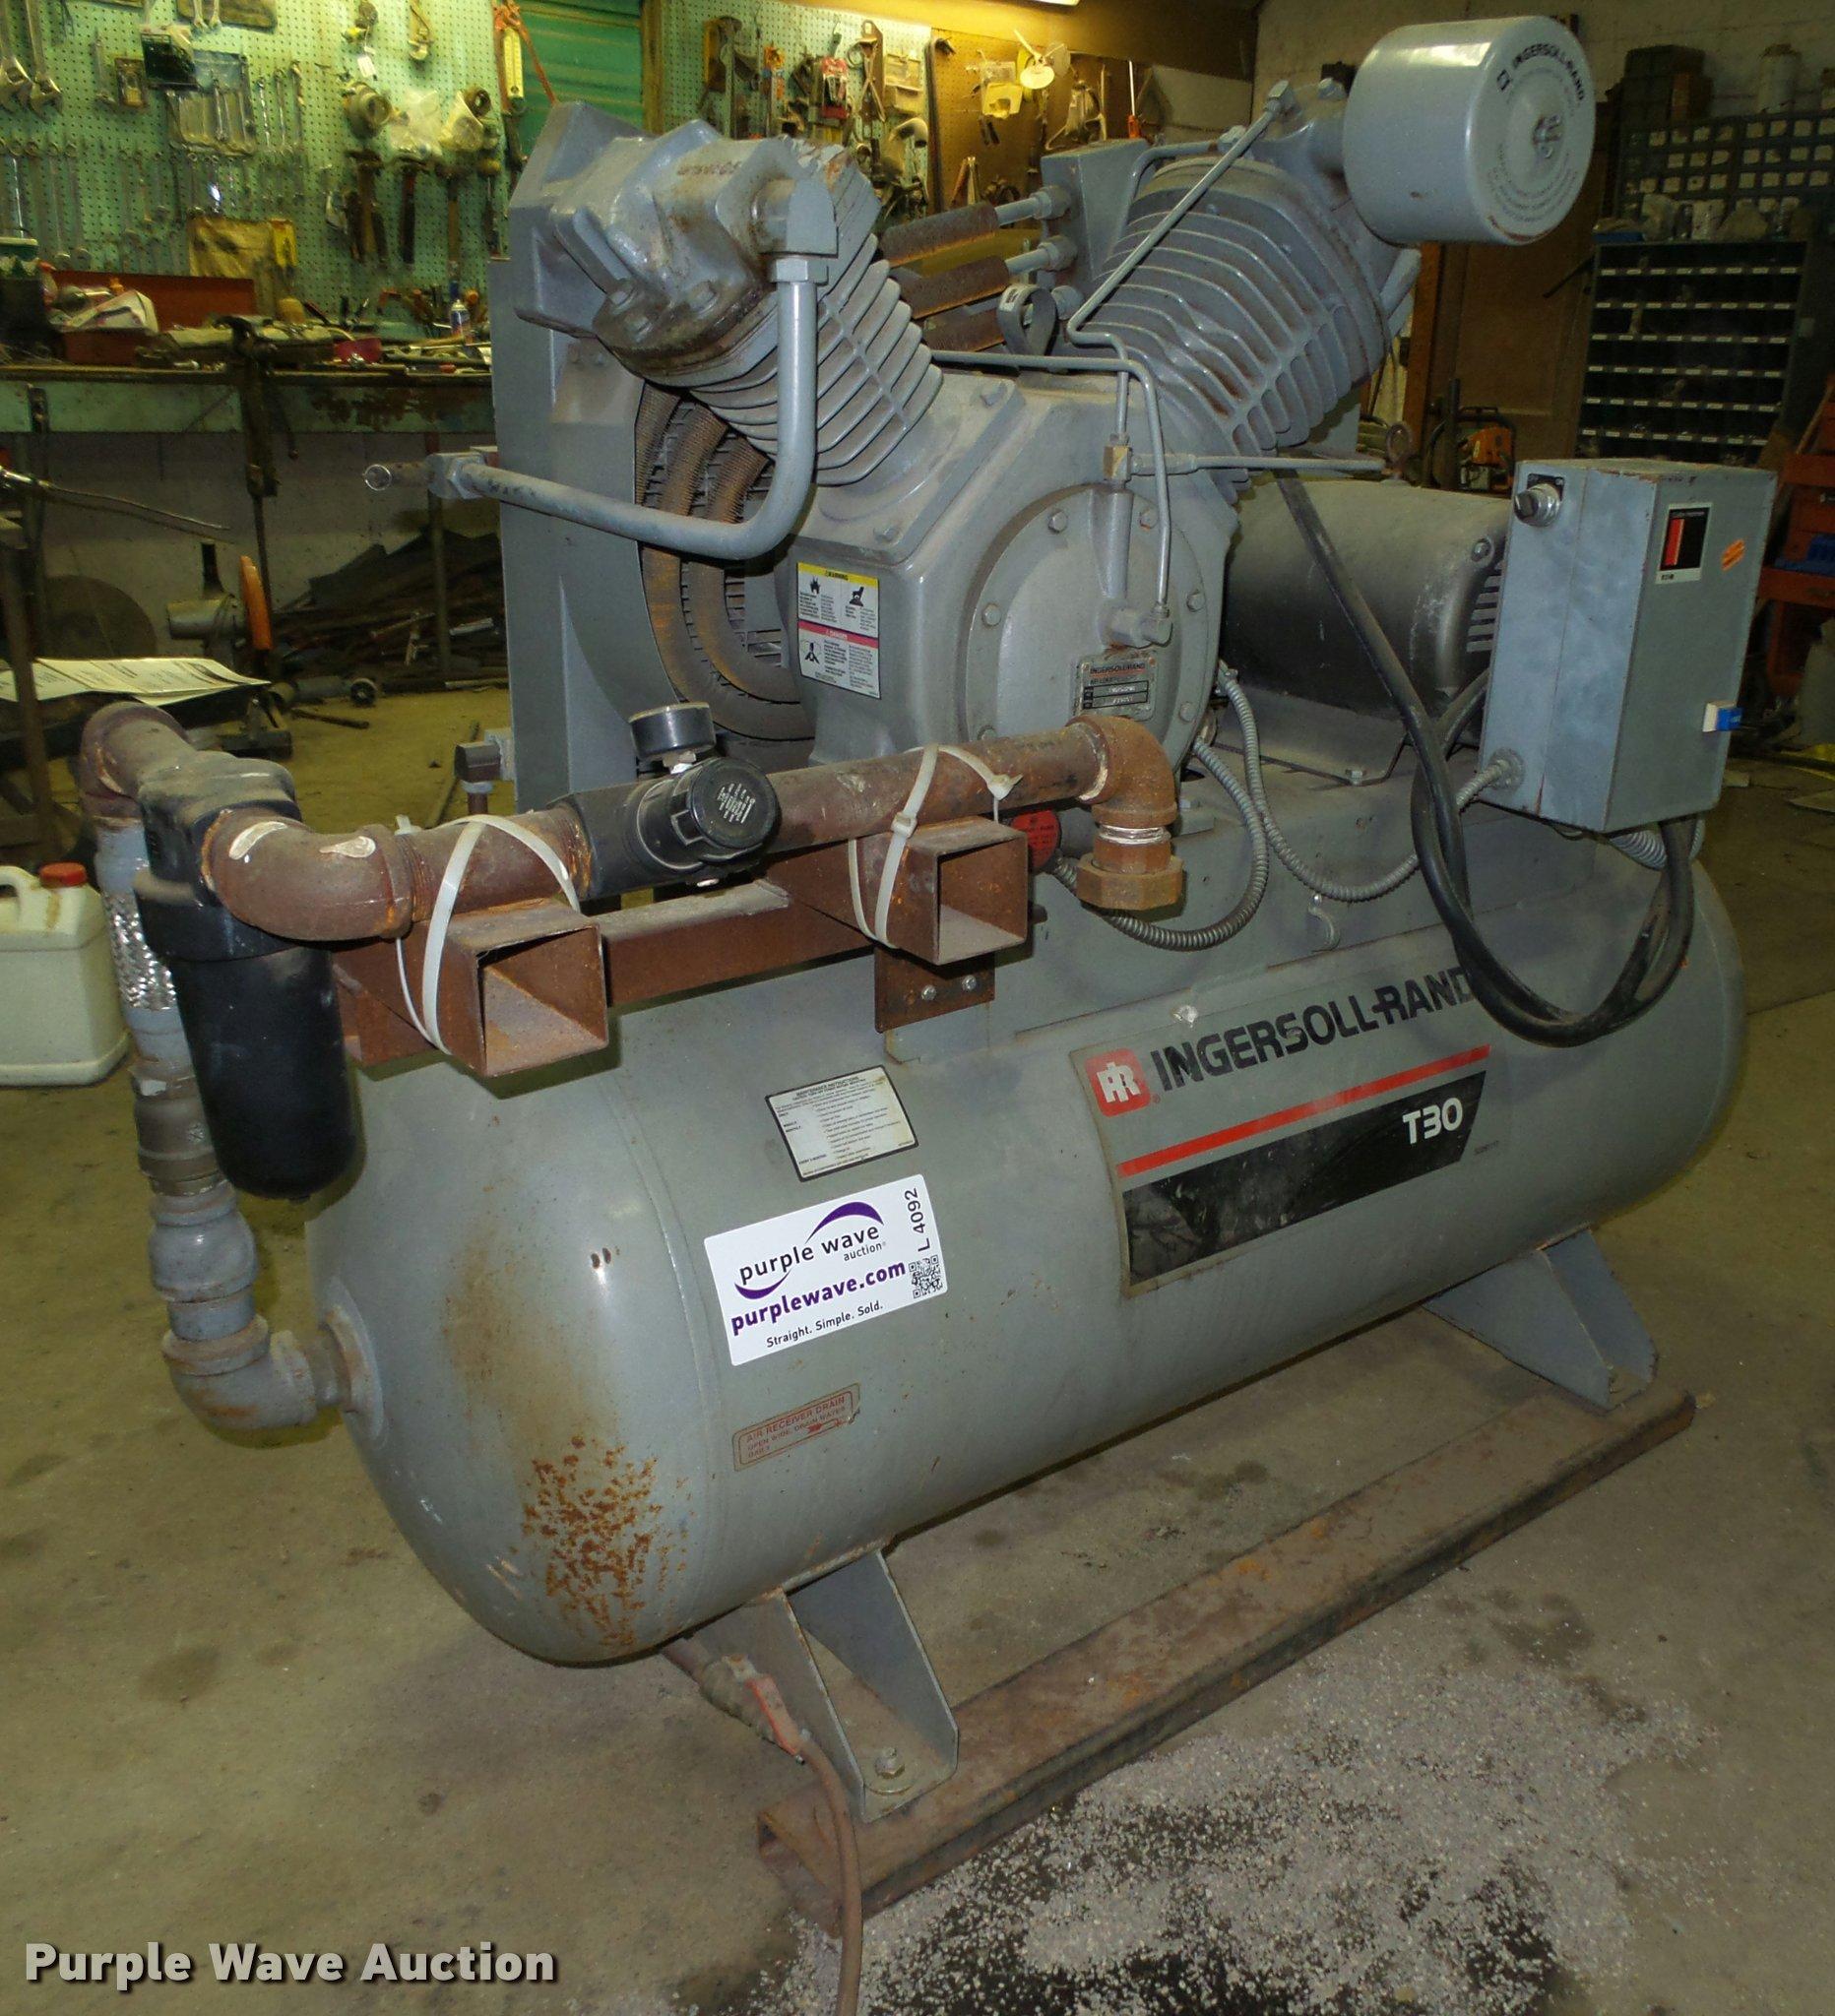 hight resolution of 1993 ingersoll rand t30 air compressor for sale in nebraska